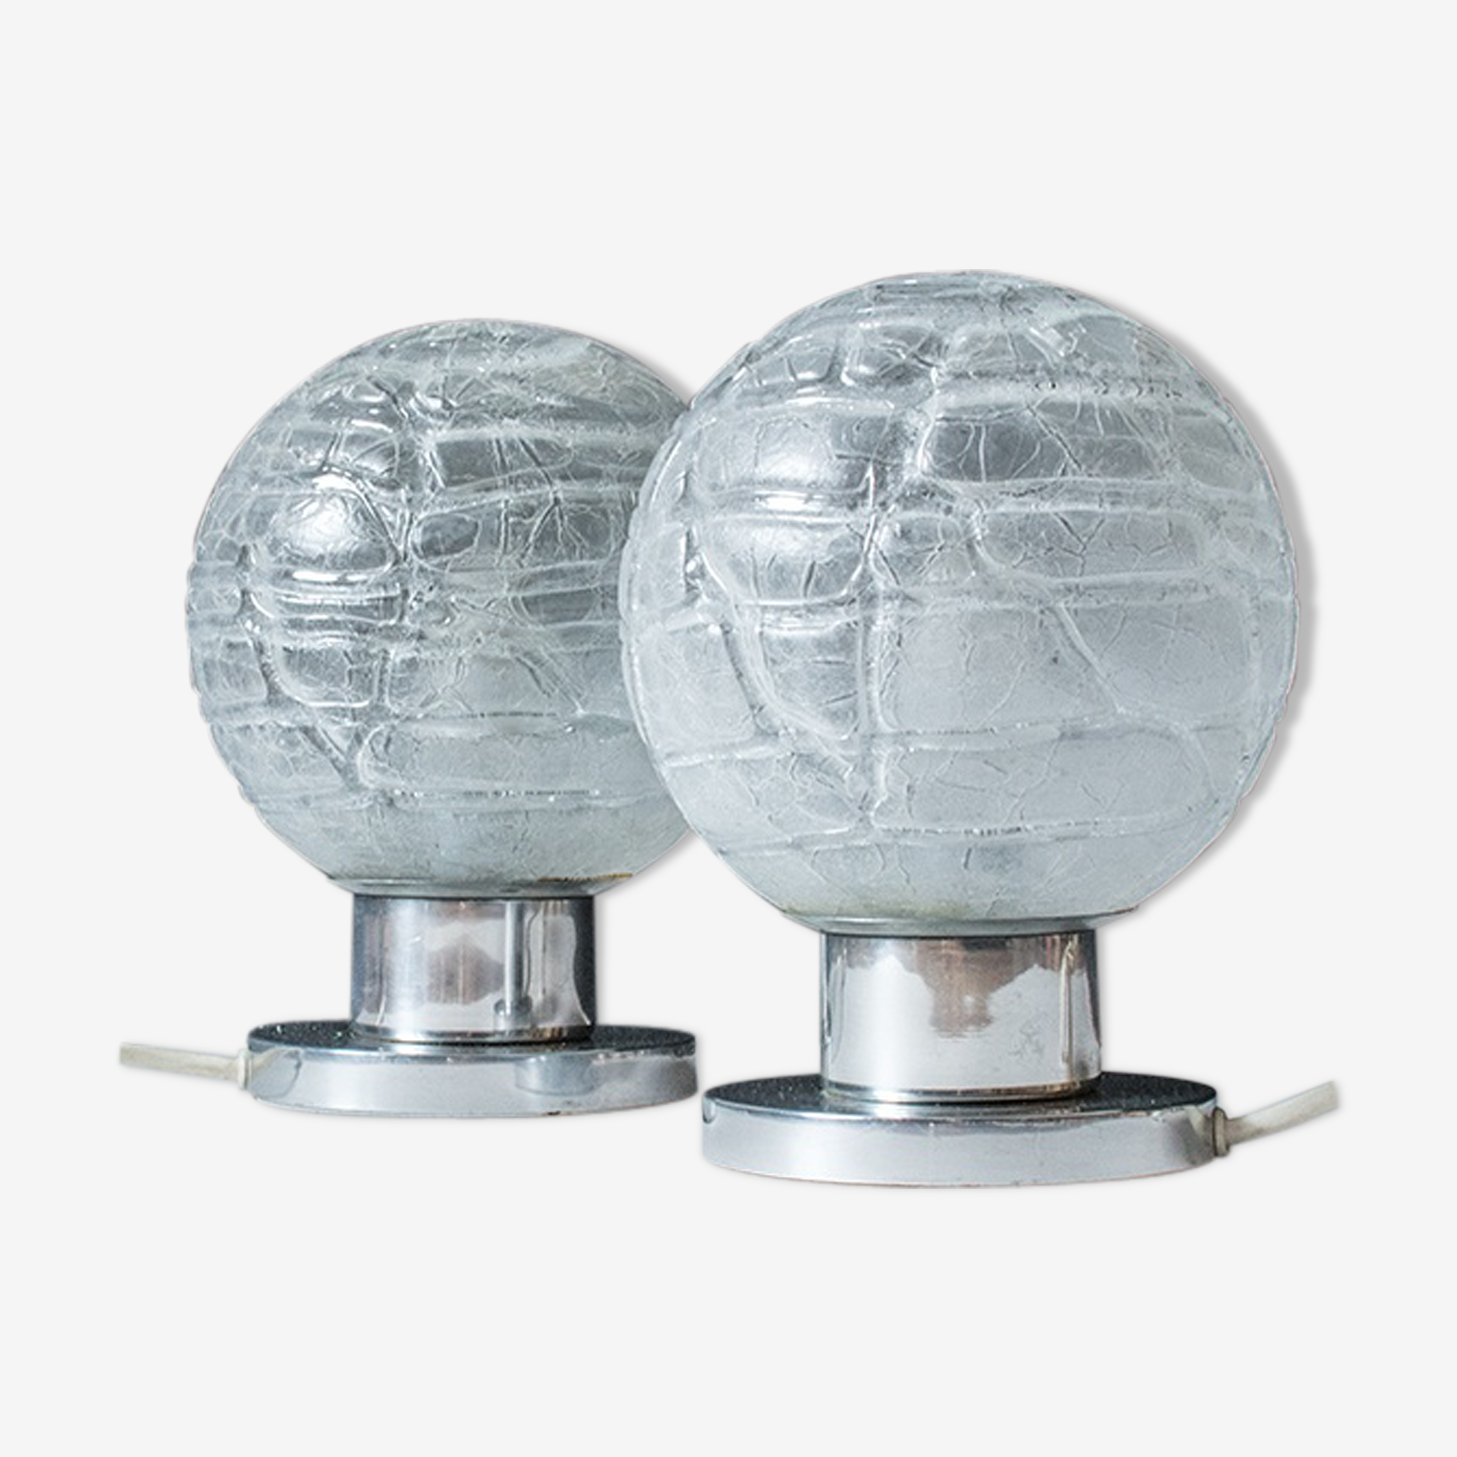 Pair of doria bedside lamps